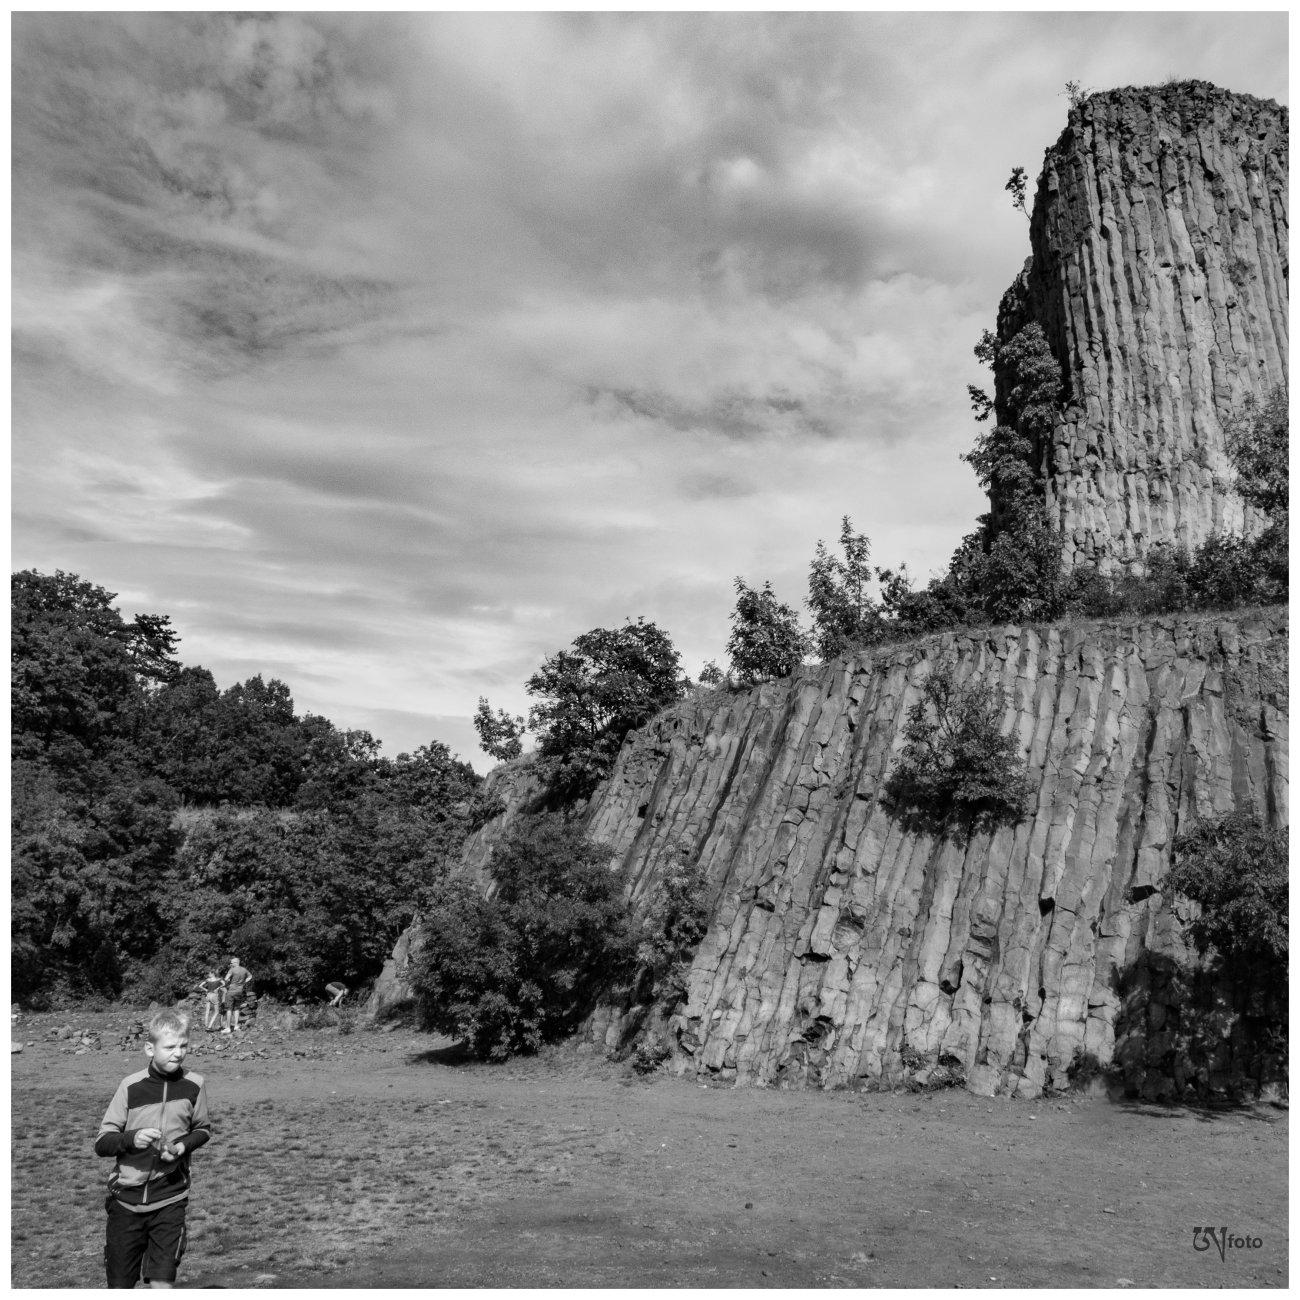 Hegyestű Geological Visitor Site, Monoszló, Hungary